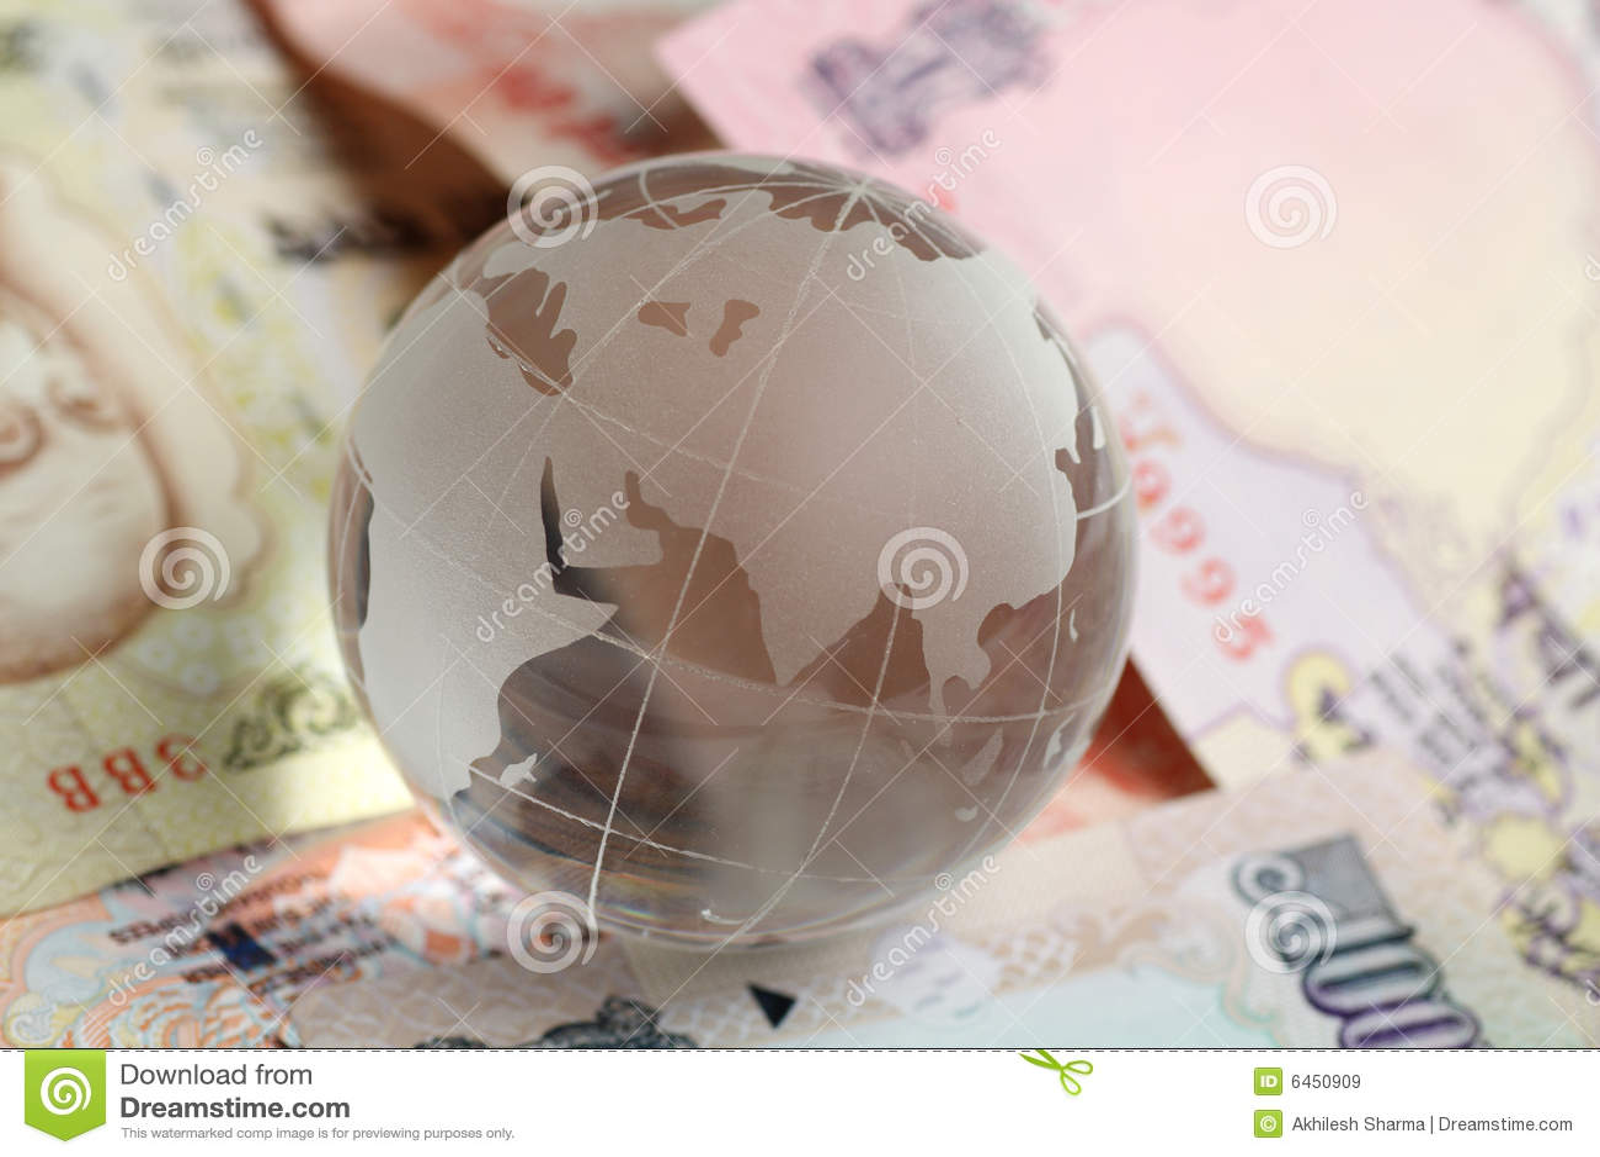 Hindusi globe waluty